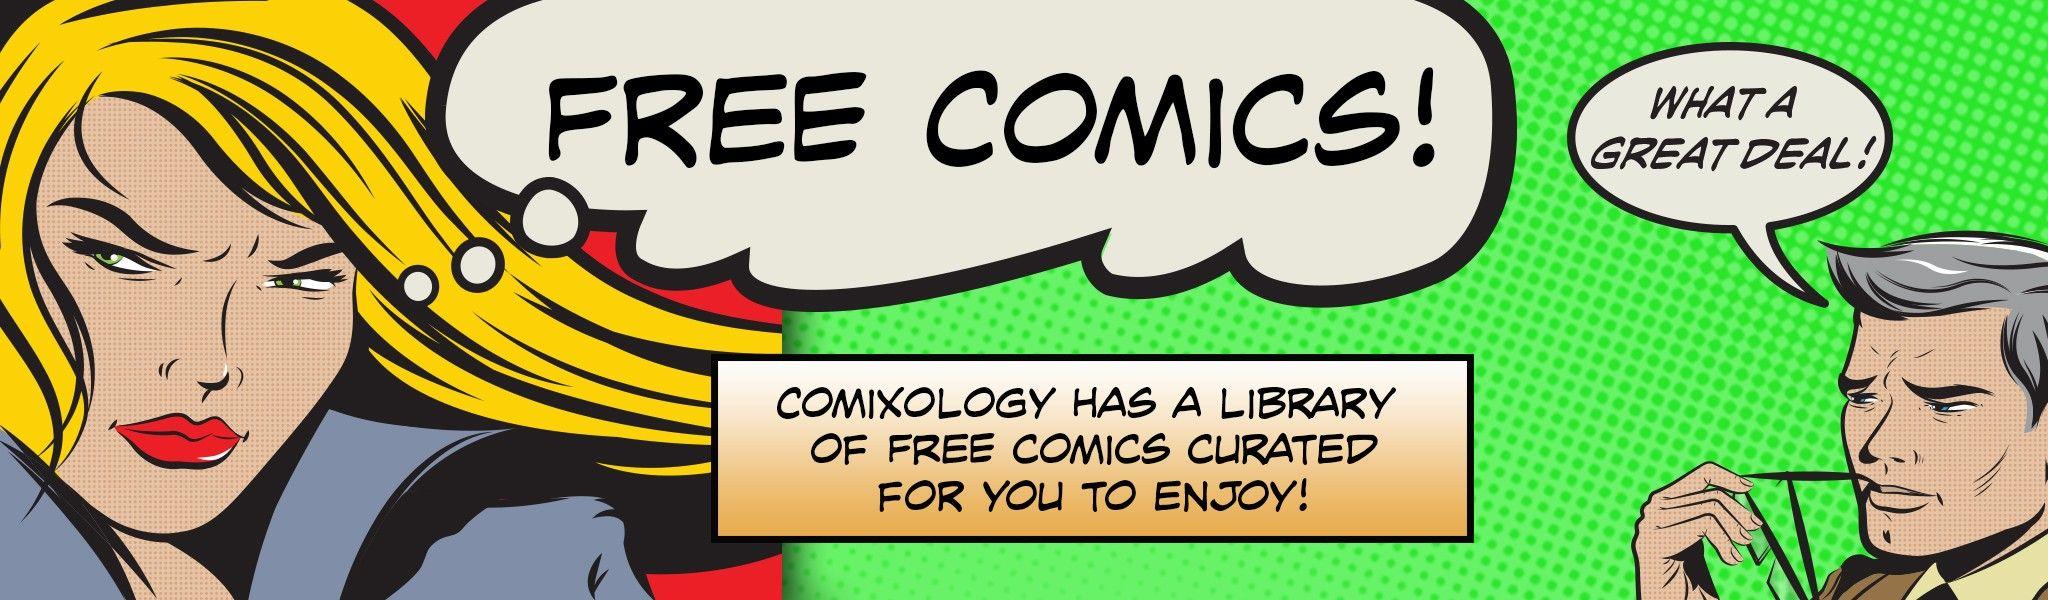 [Comixology]132 ausgewählte Comics kostenlos